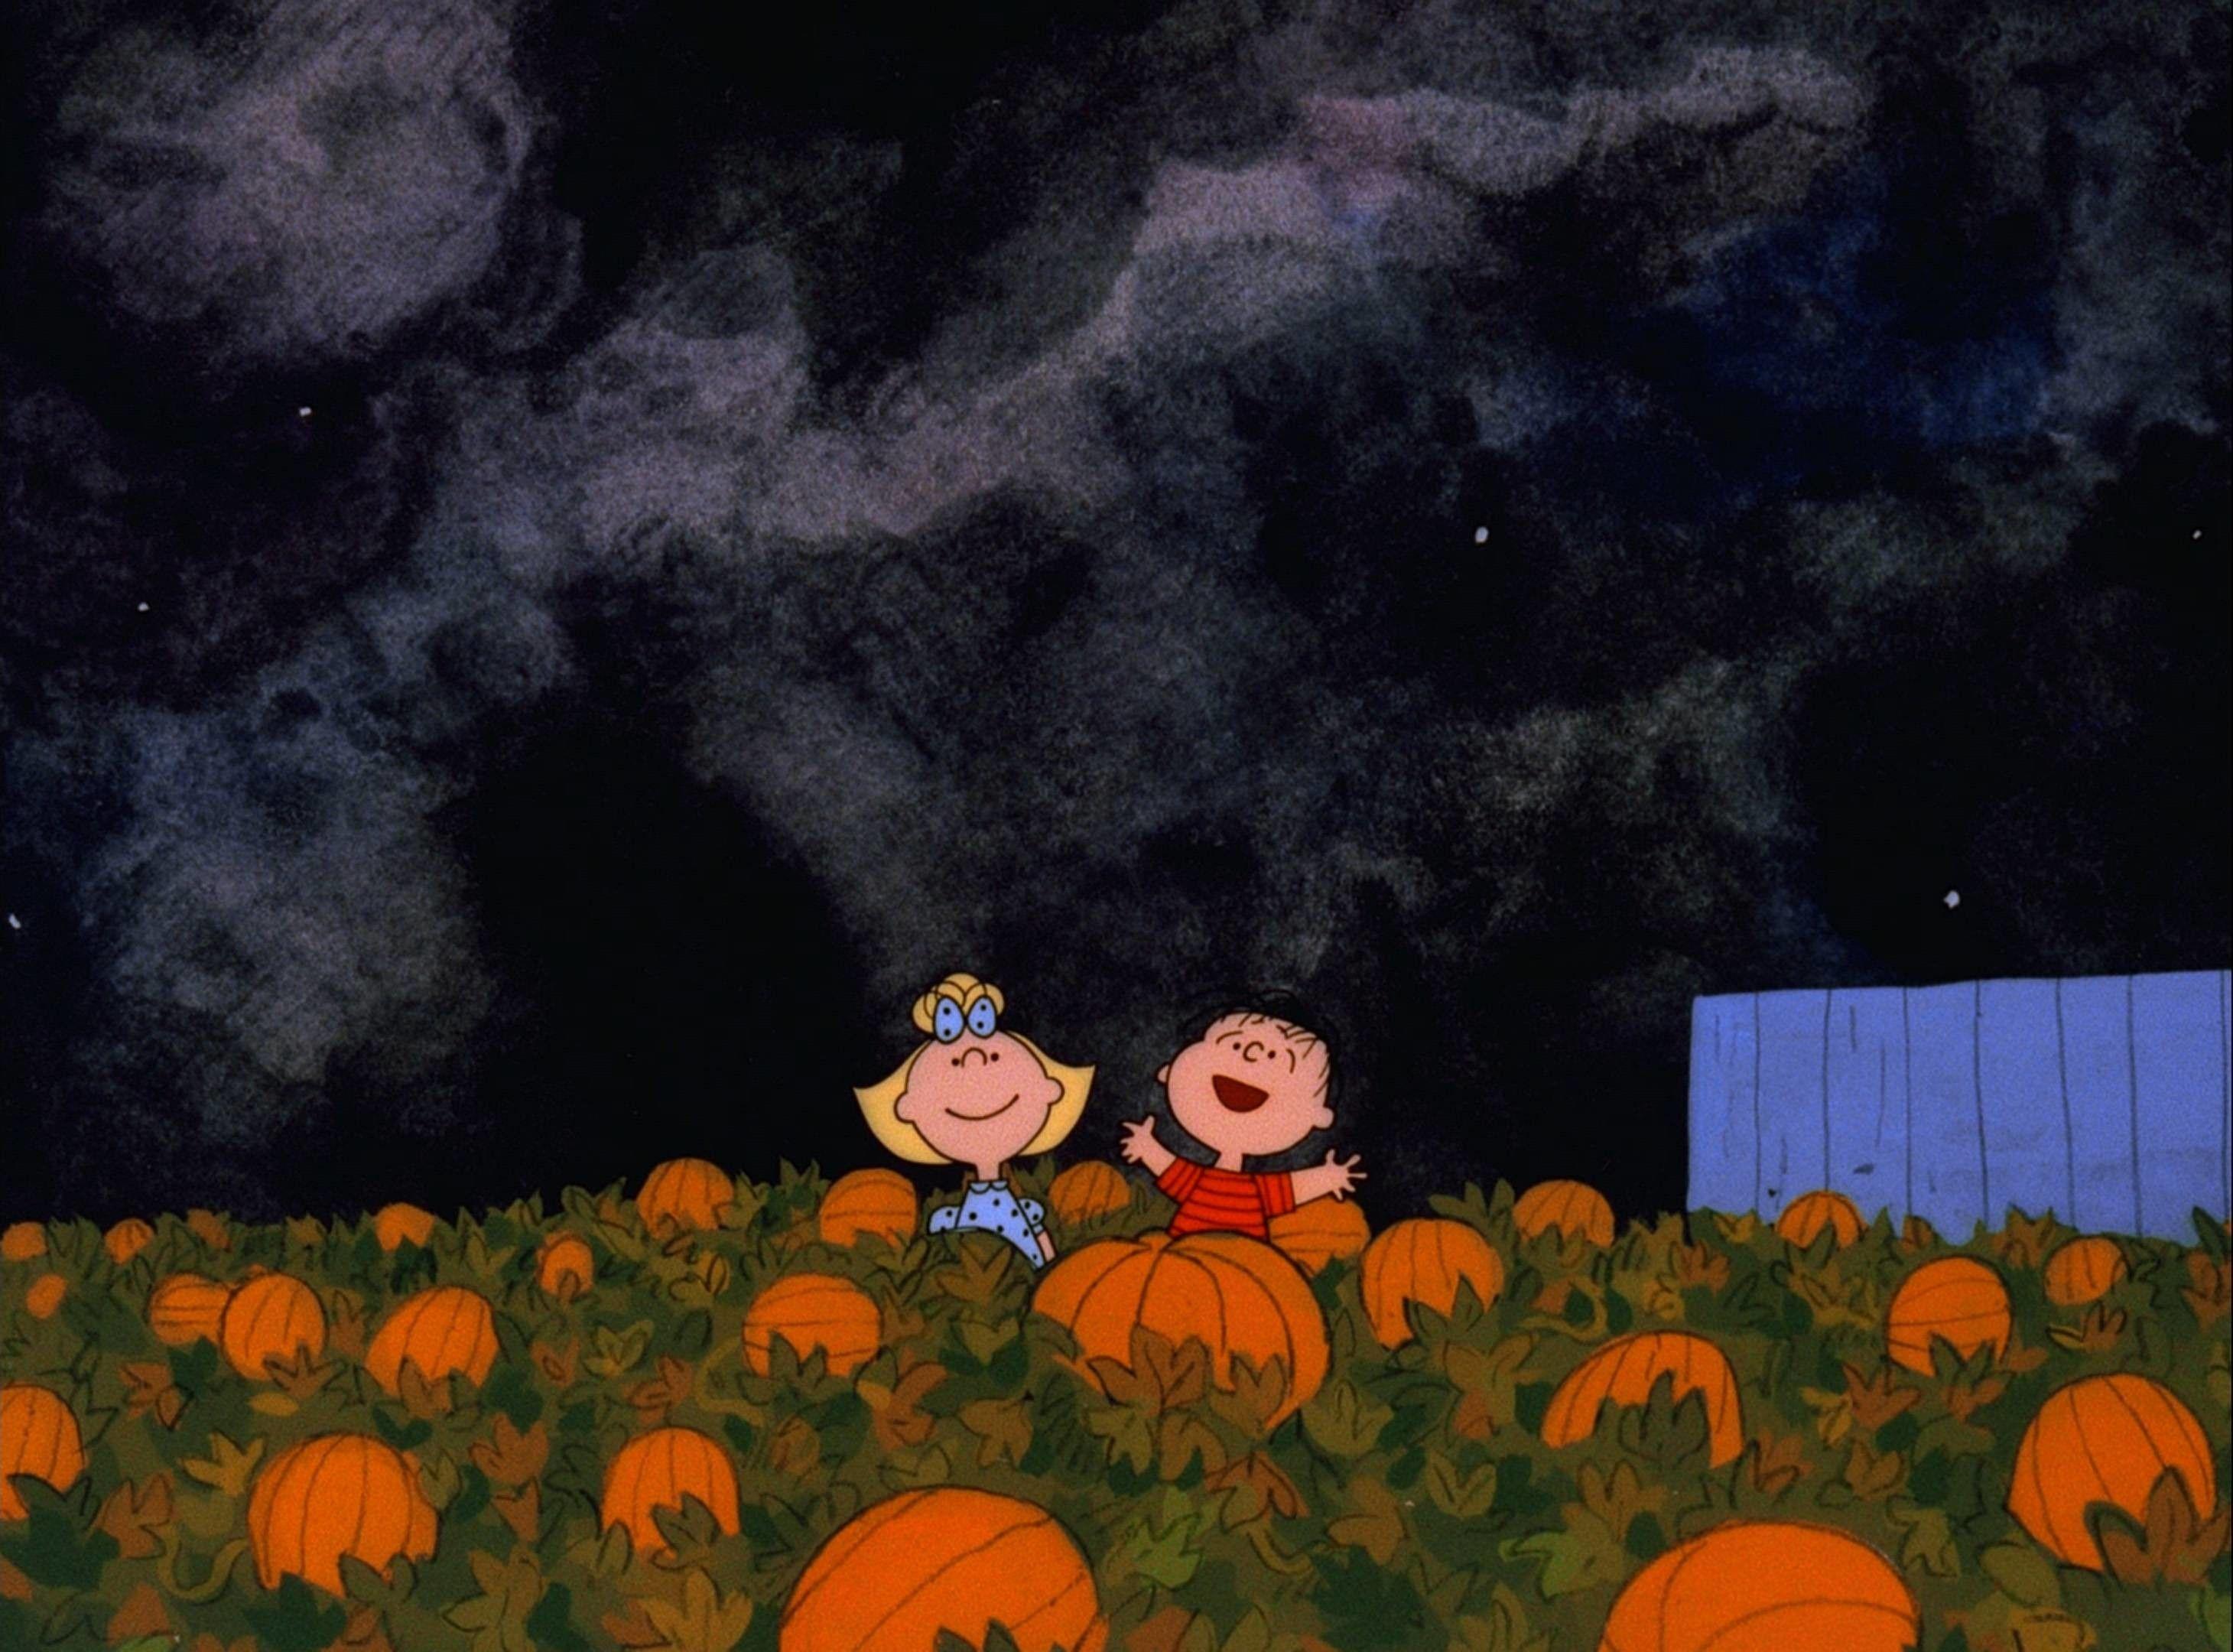 2920x2160 Charlie Brown Halloween Wallpapers Hd Wallpapers Inn Halloween Wallpaper Charlie Brown Halloween Halloween Pumpkin Images